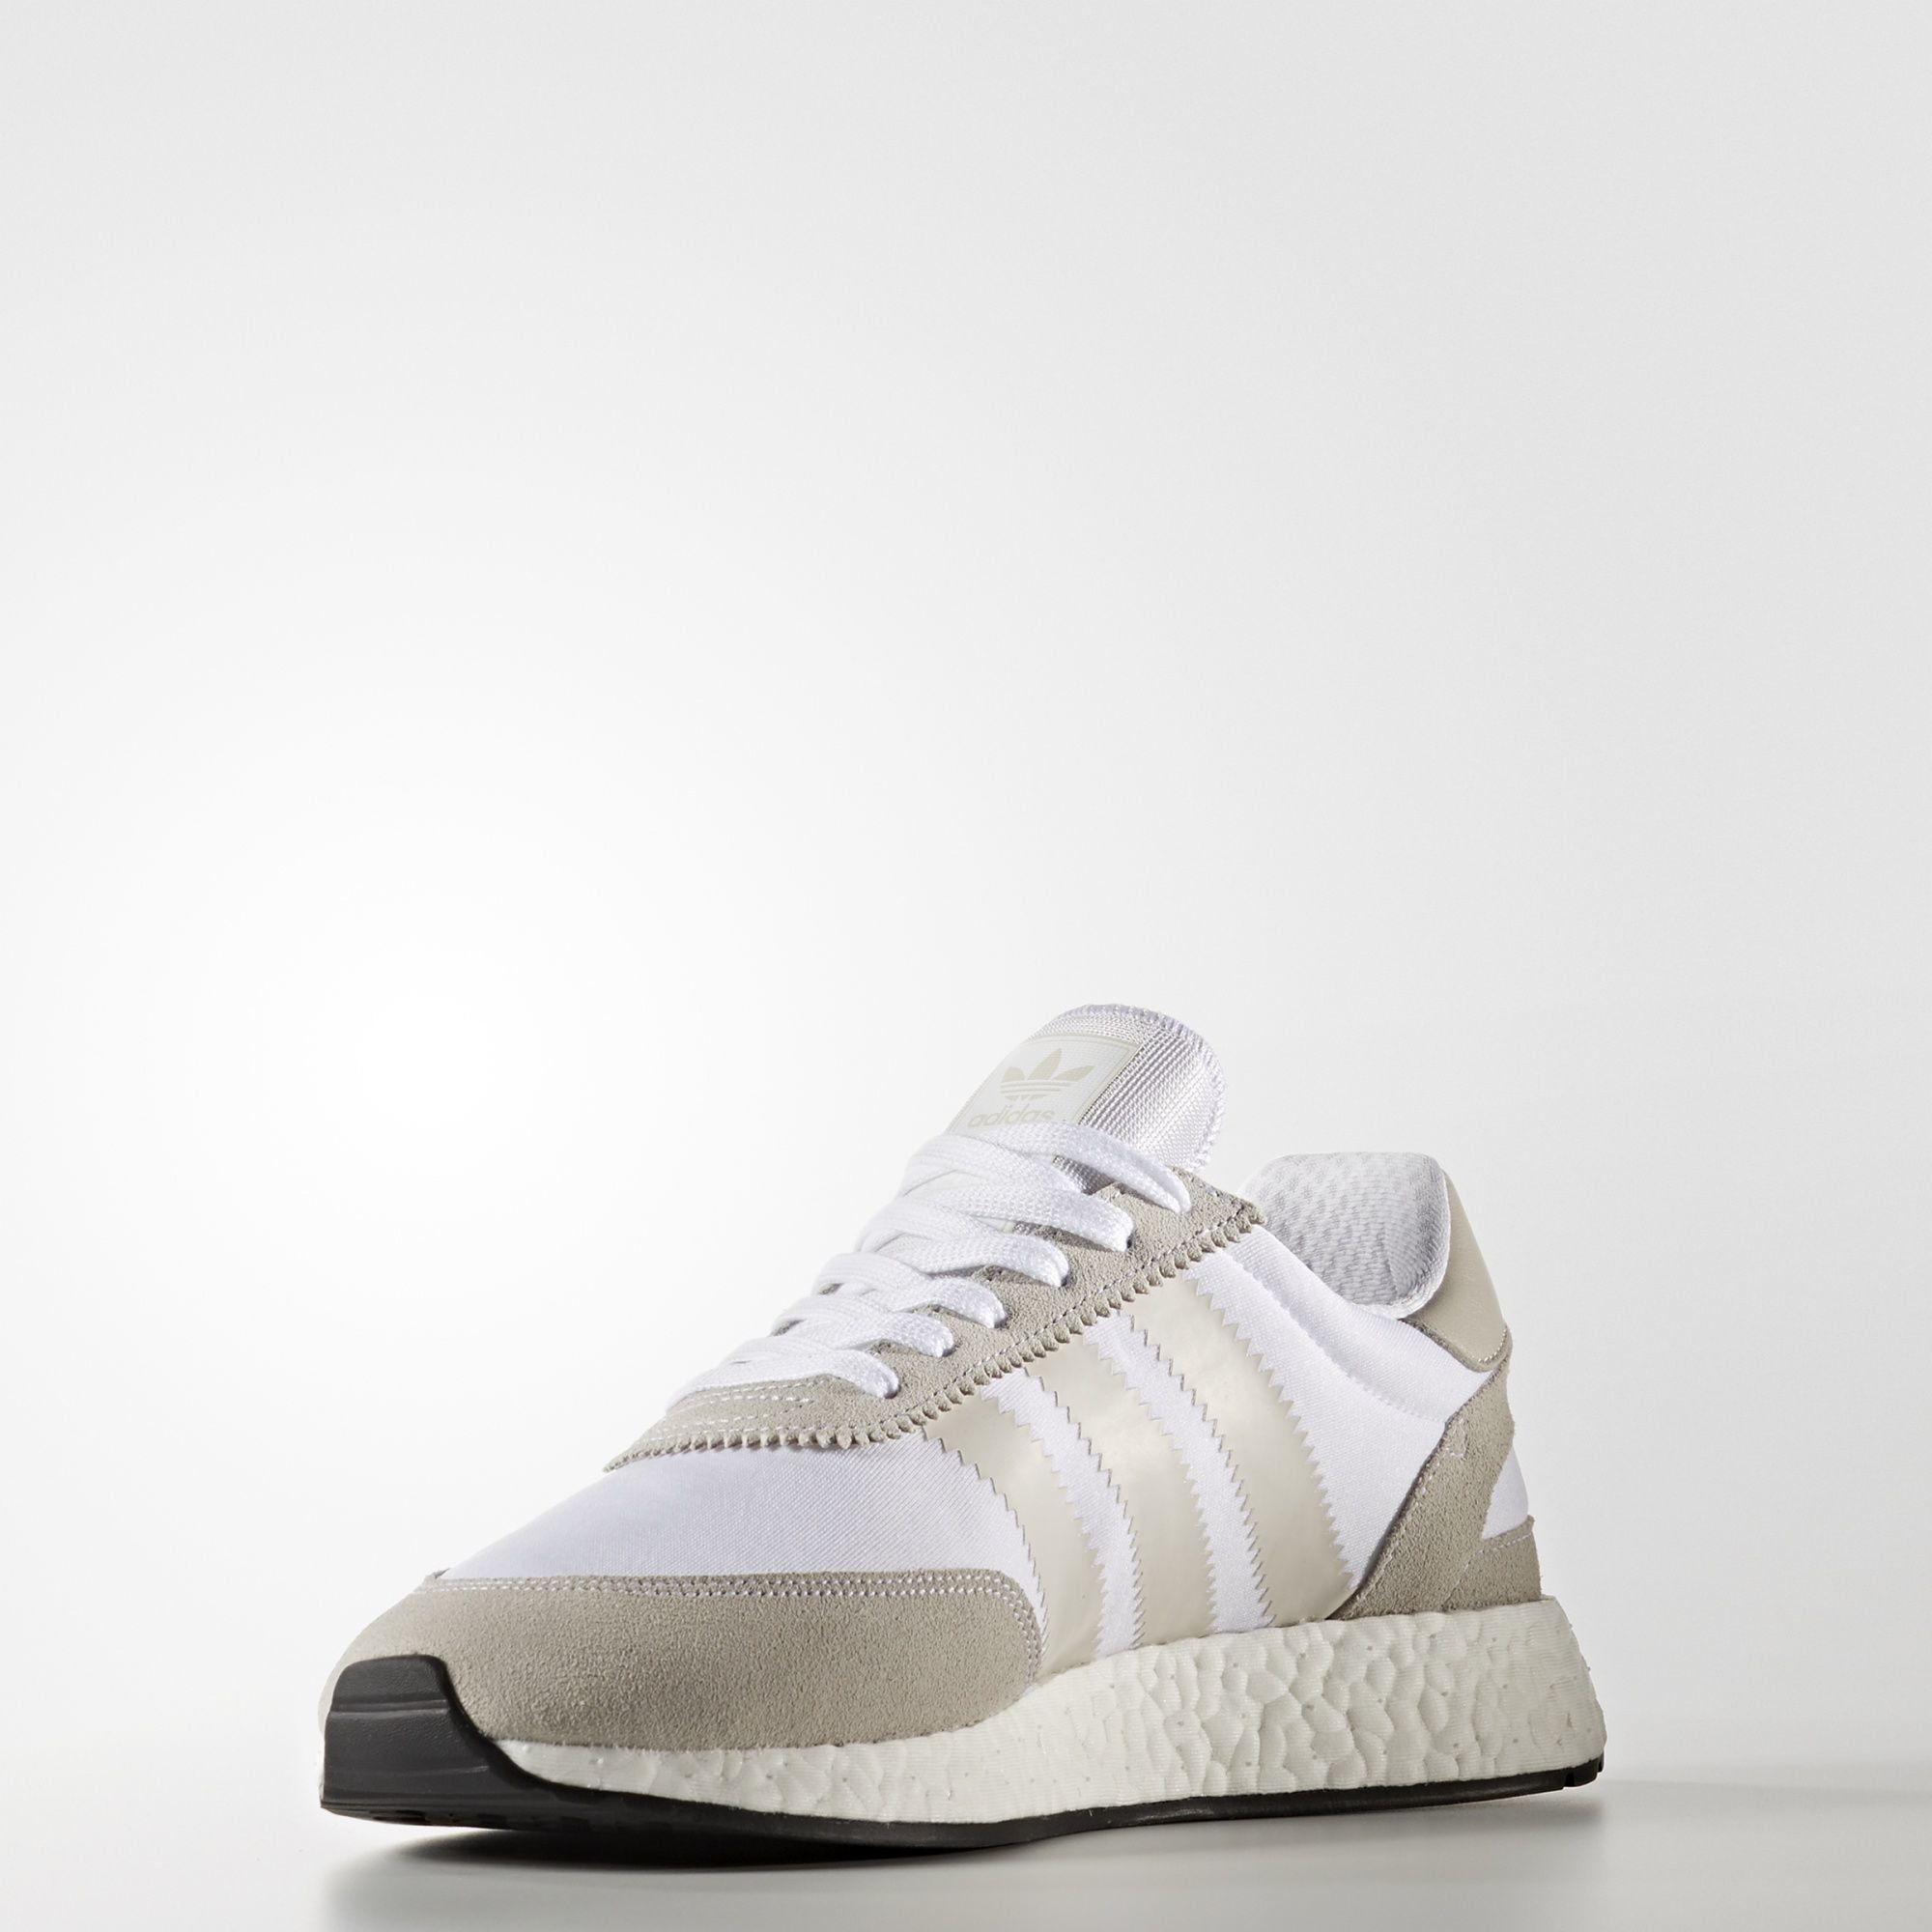 Adidas Iniki BB2101